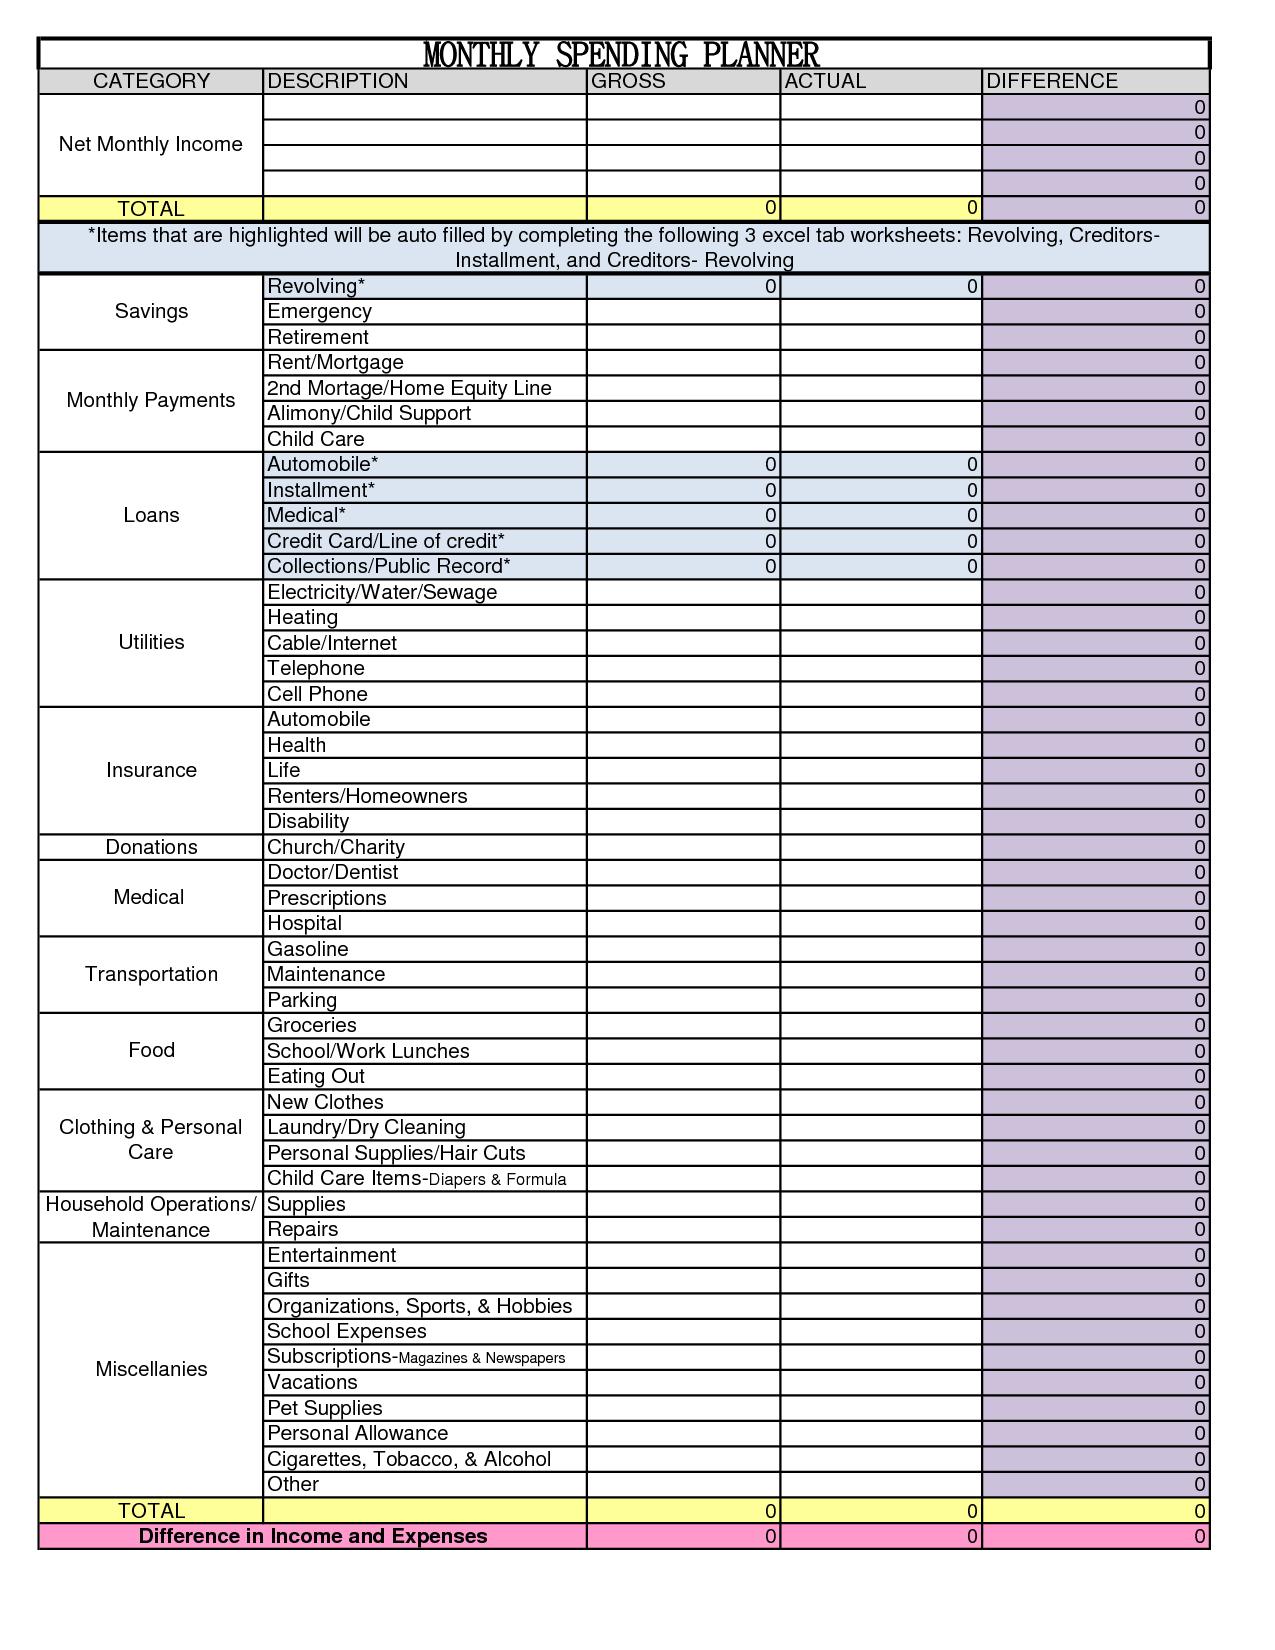 Budget Worksheet Examples and Worksheet Non Profit Bud Worksheet Mifirental Free Printables